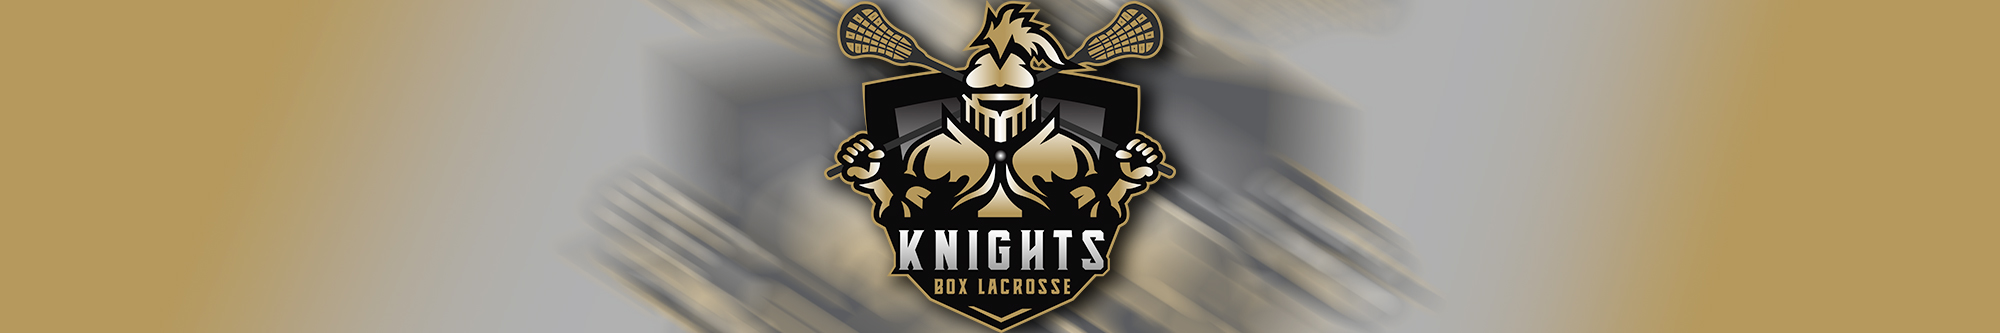 knights-box-lacrosse